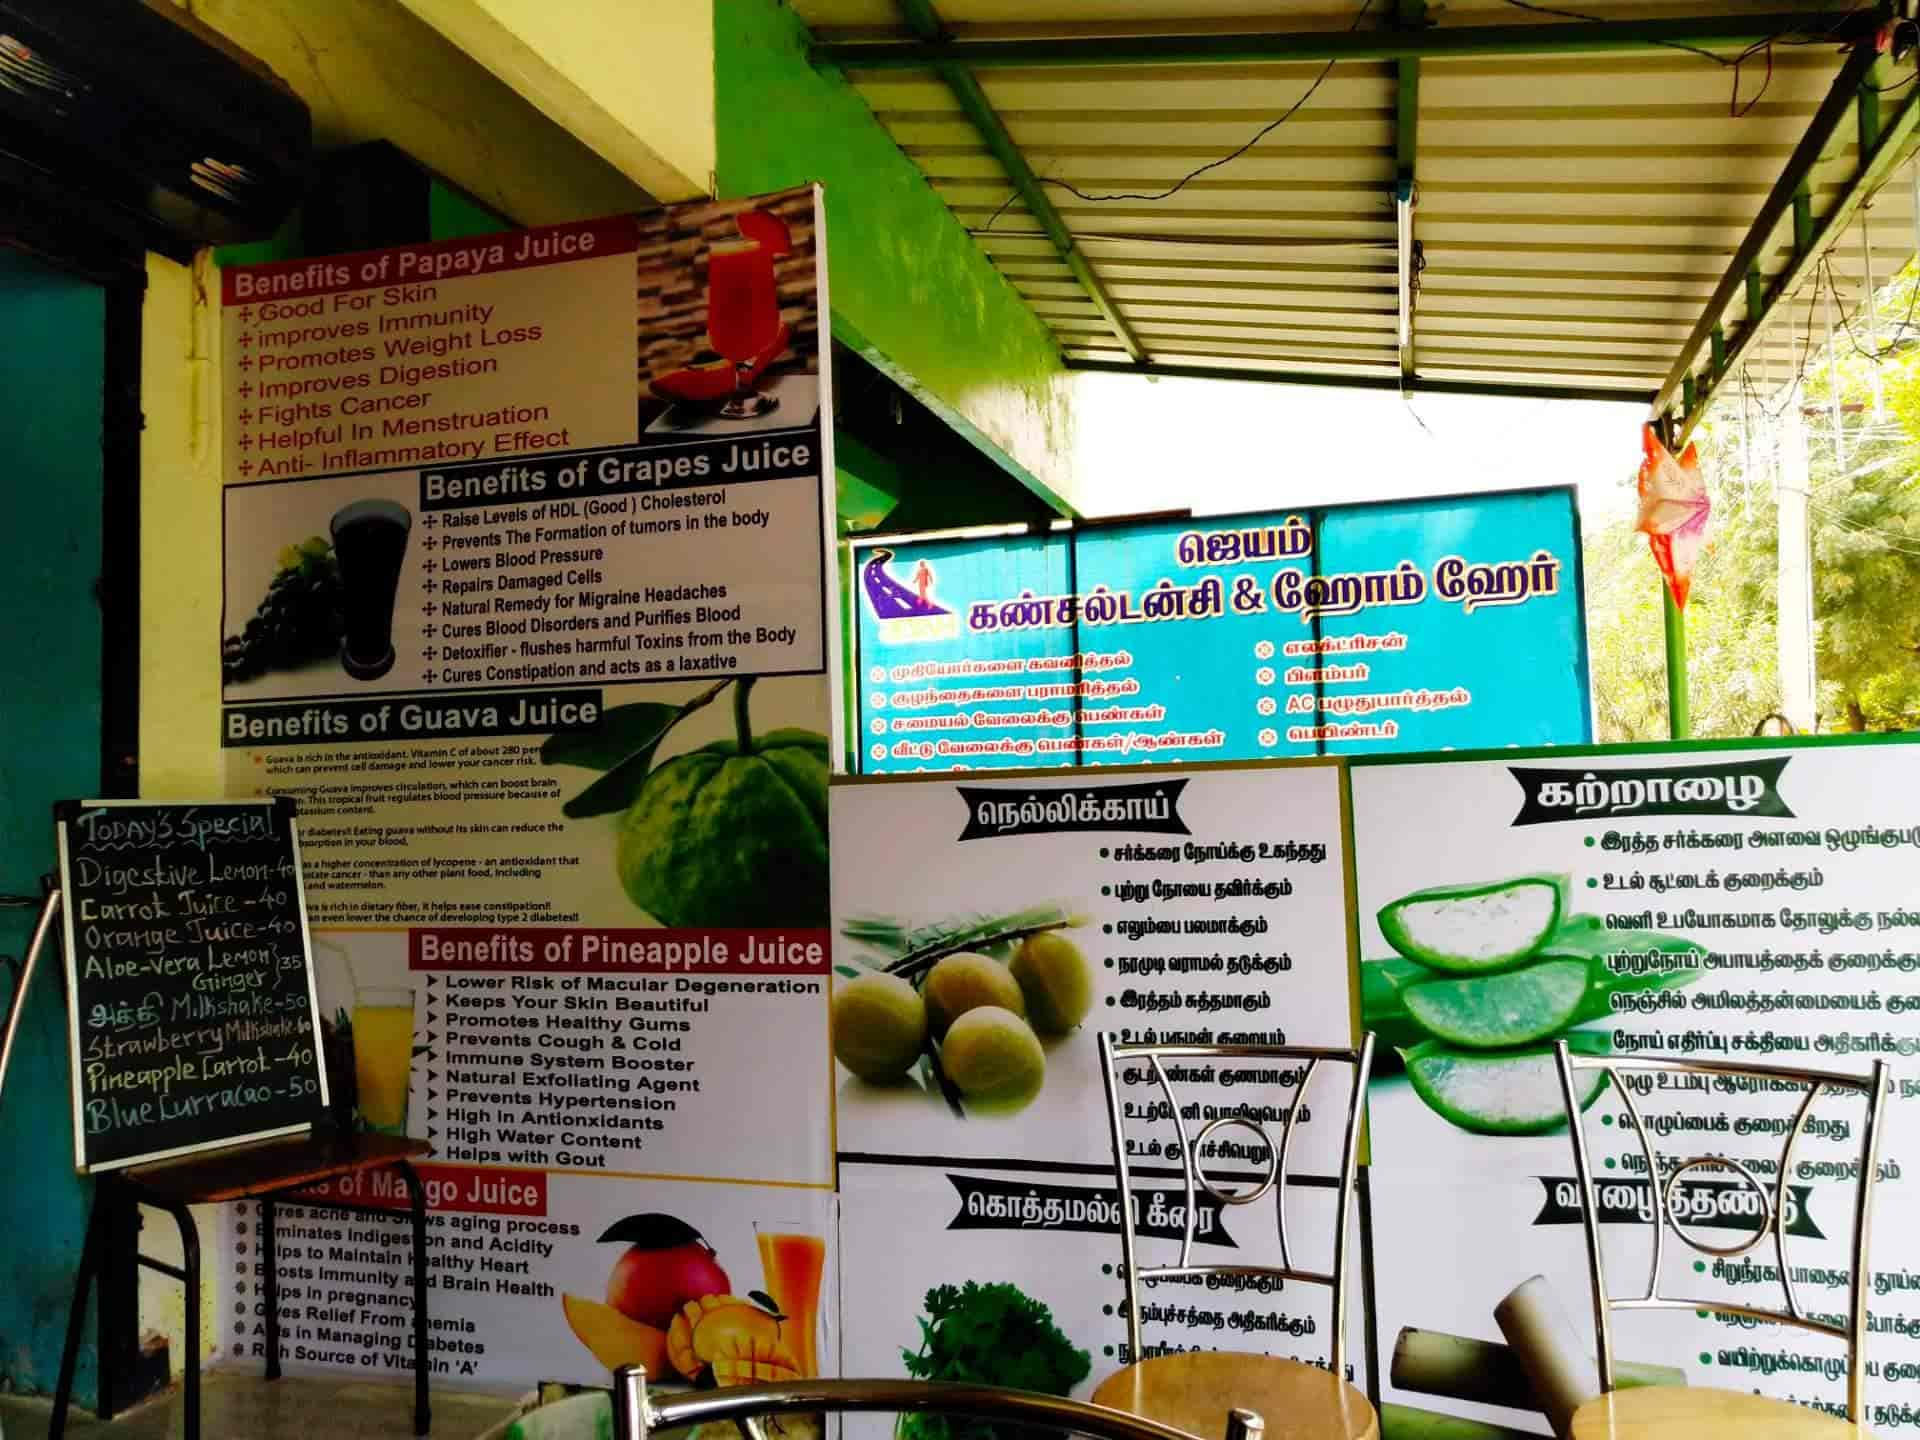 GULP JUICE BAR, Perumalpuram, Tirunelveli - Juice Centres - Justdial